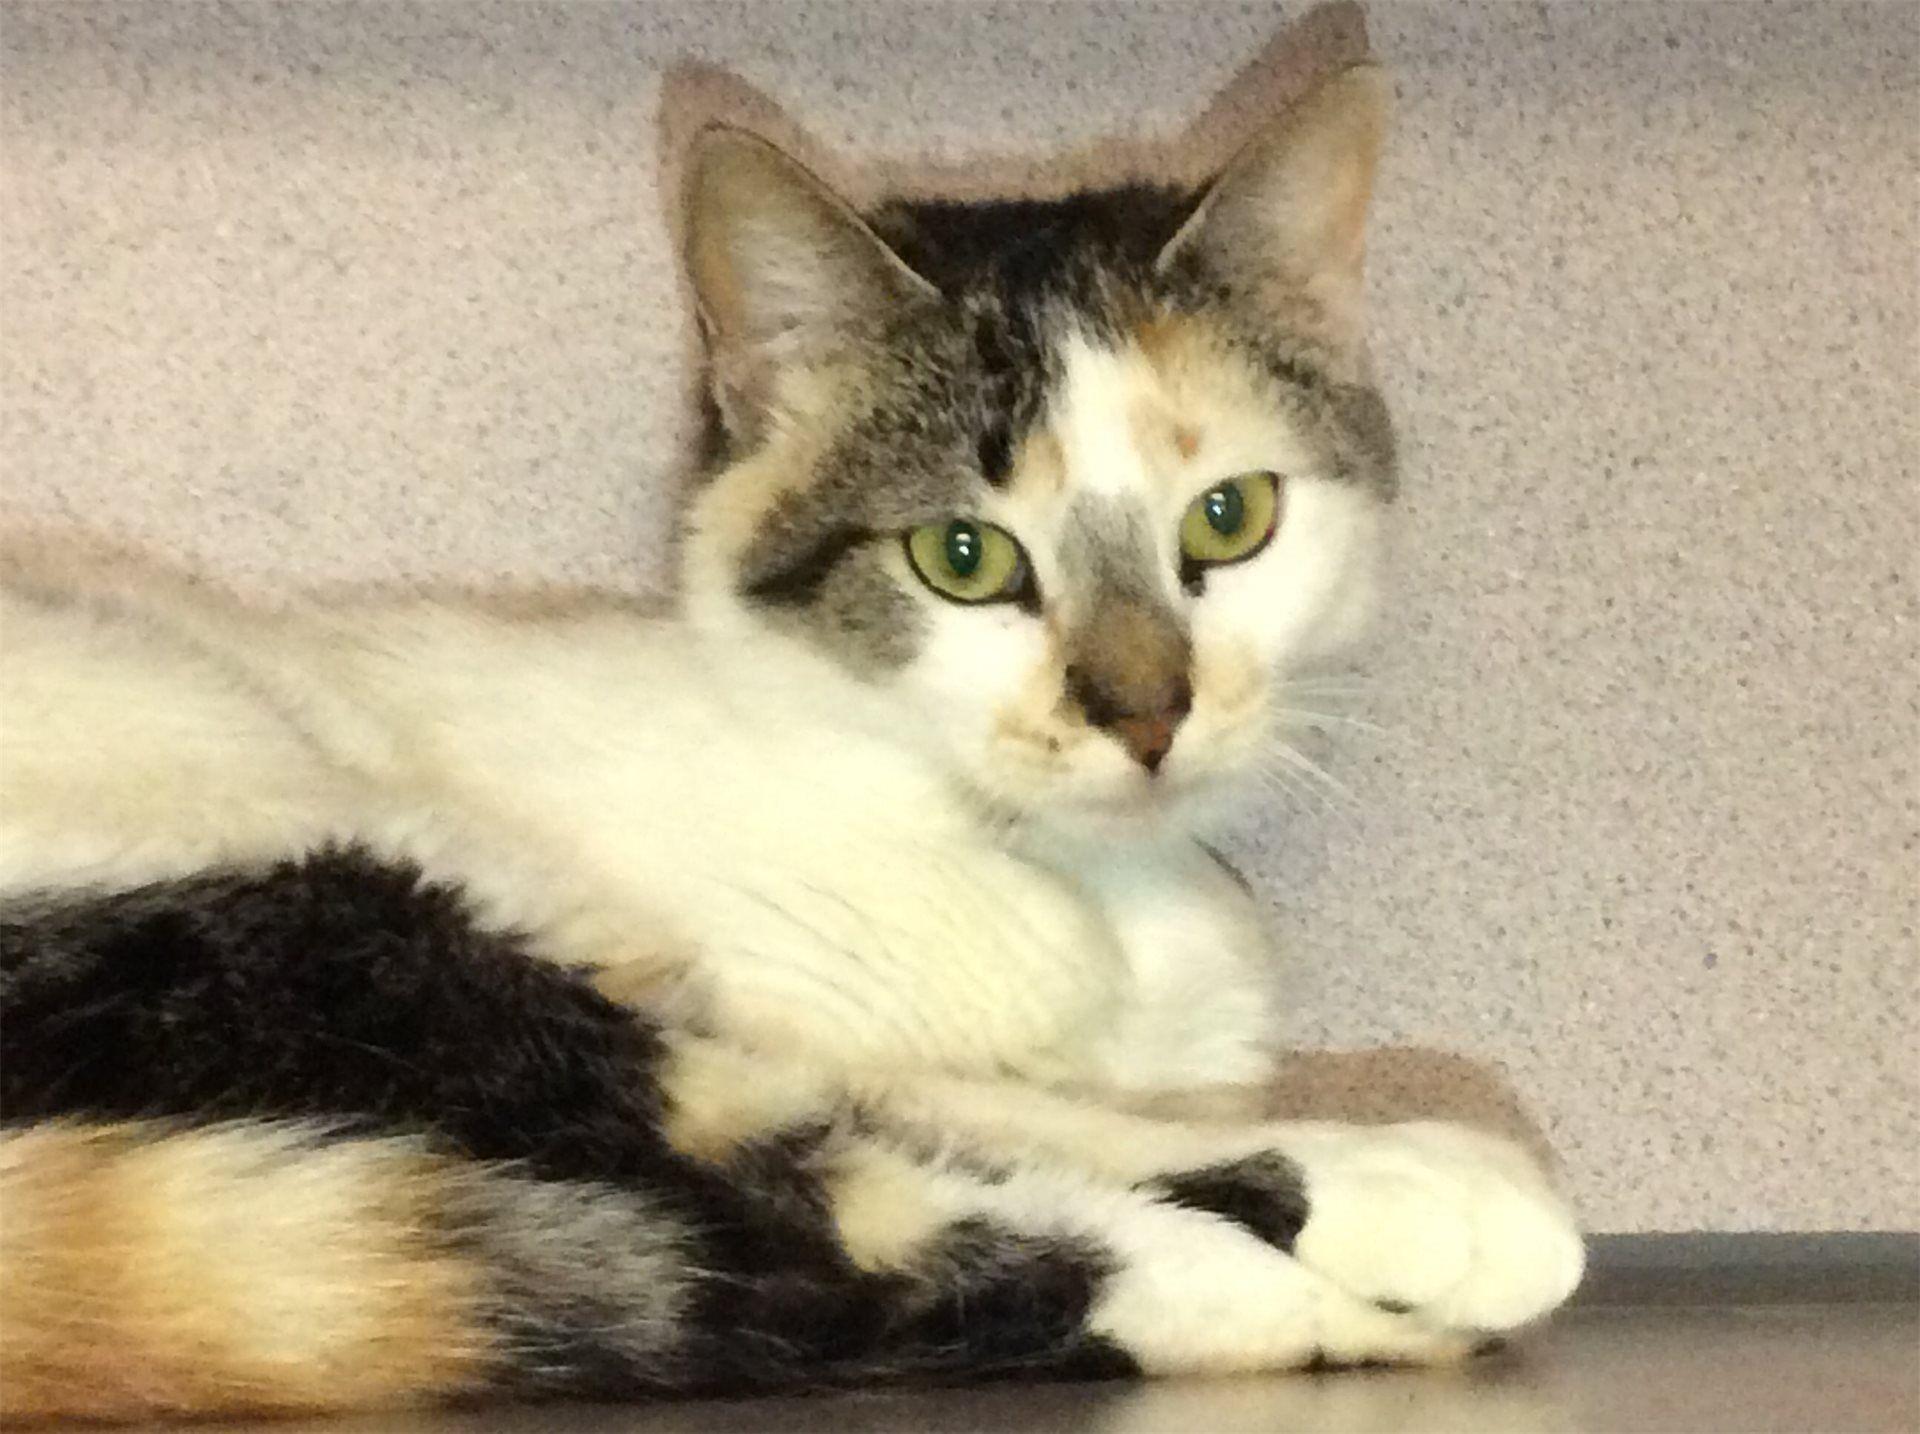 Inland Valley Humane Society Humane society, Cat